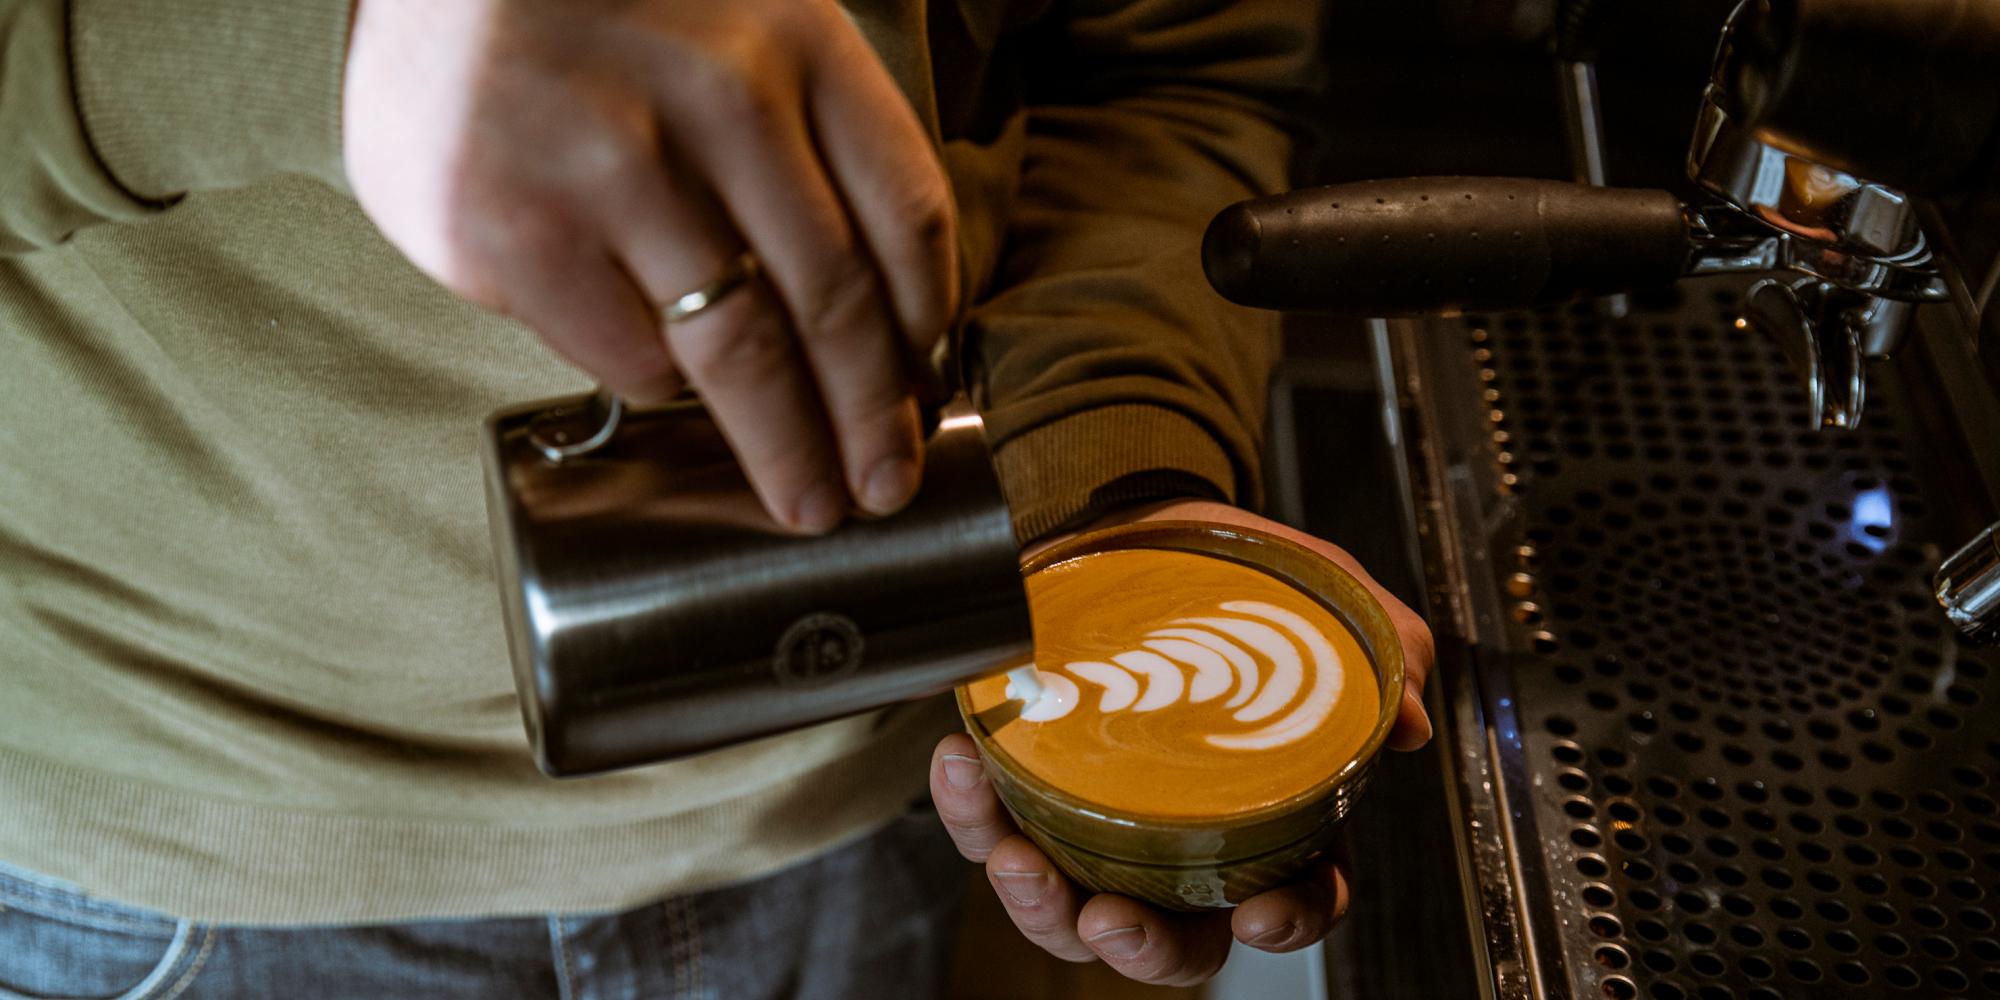 Haseborg-Kaffee-Latte-Art